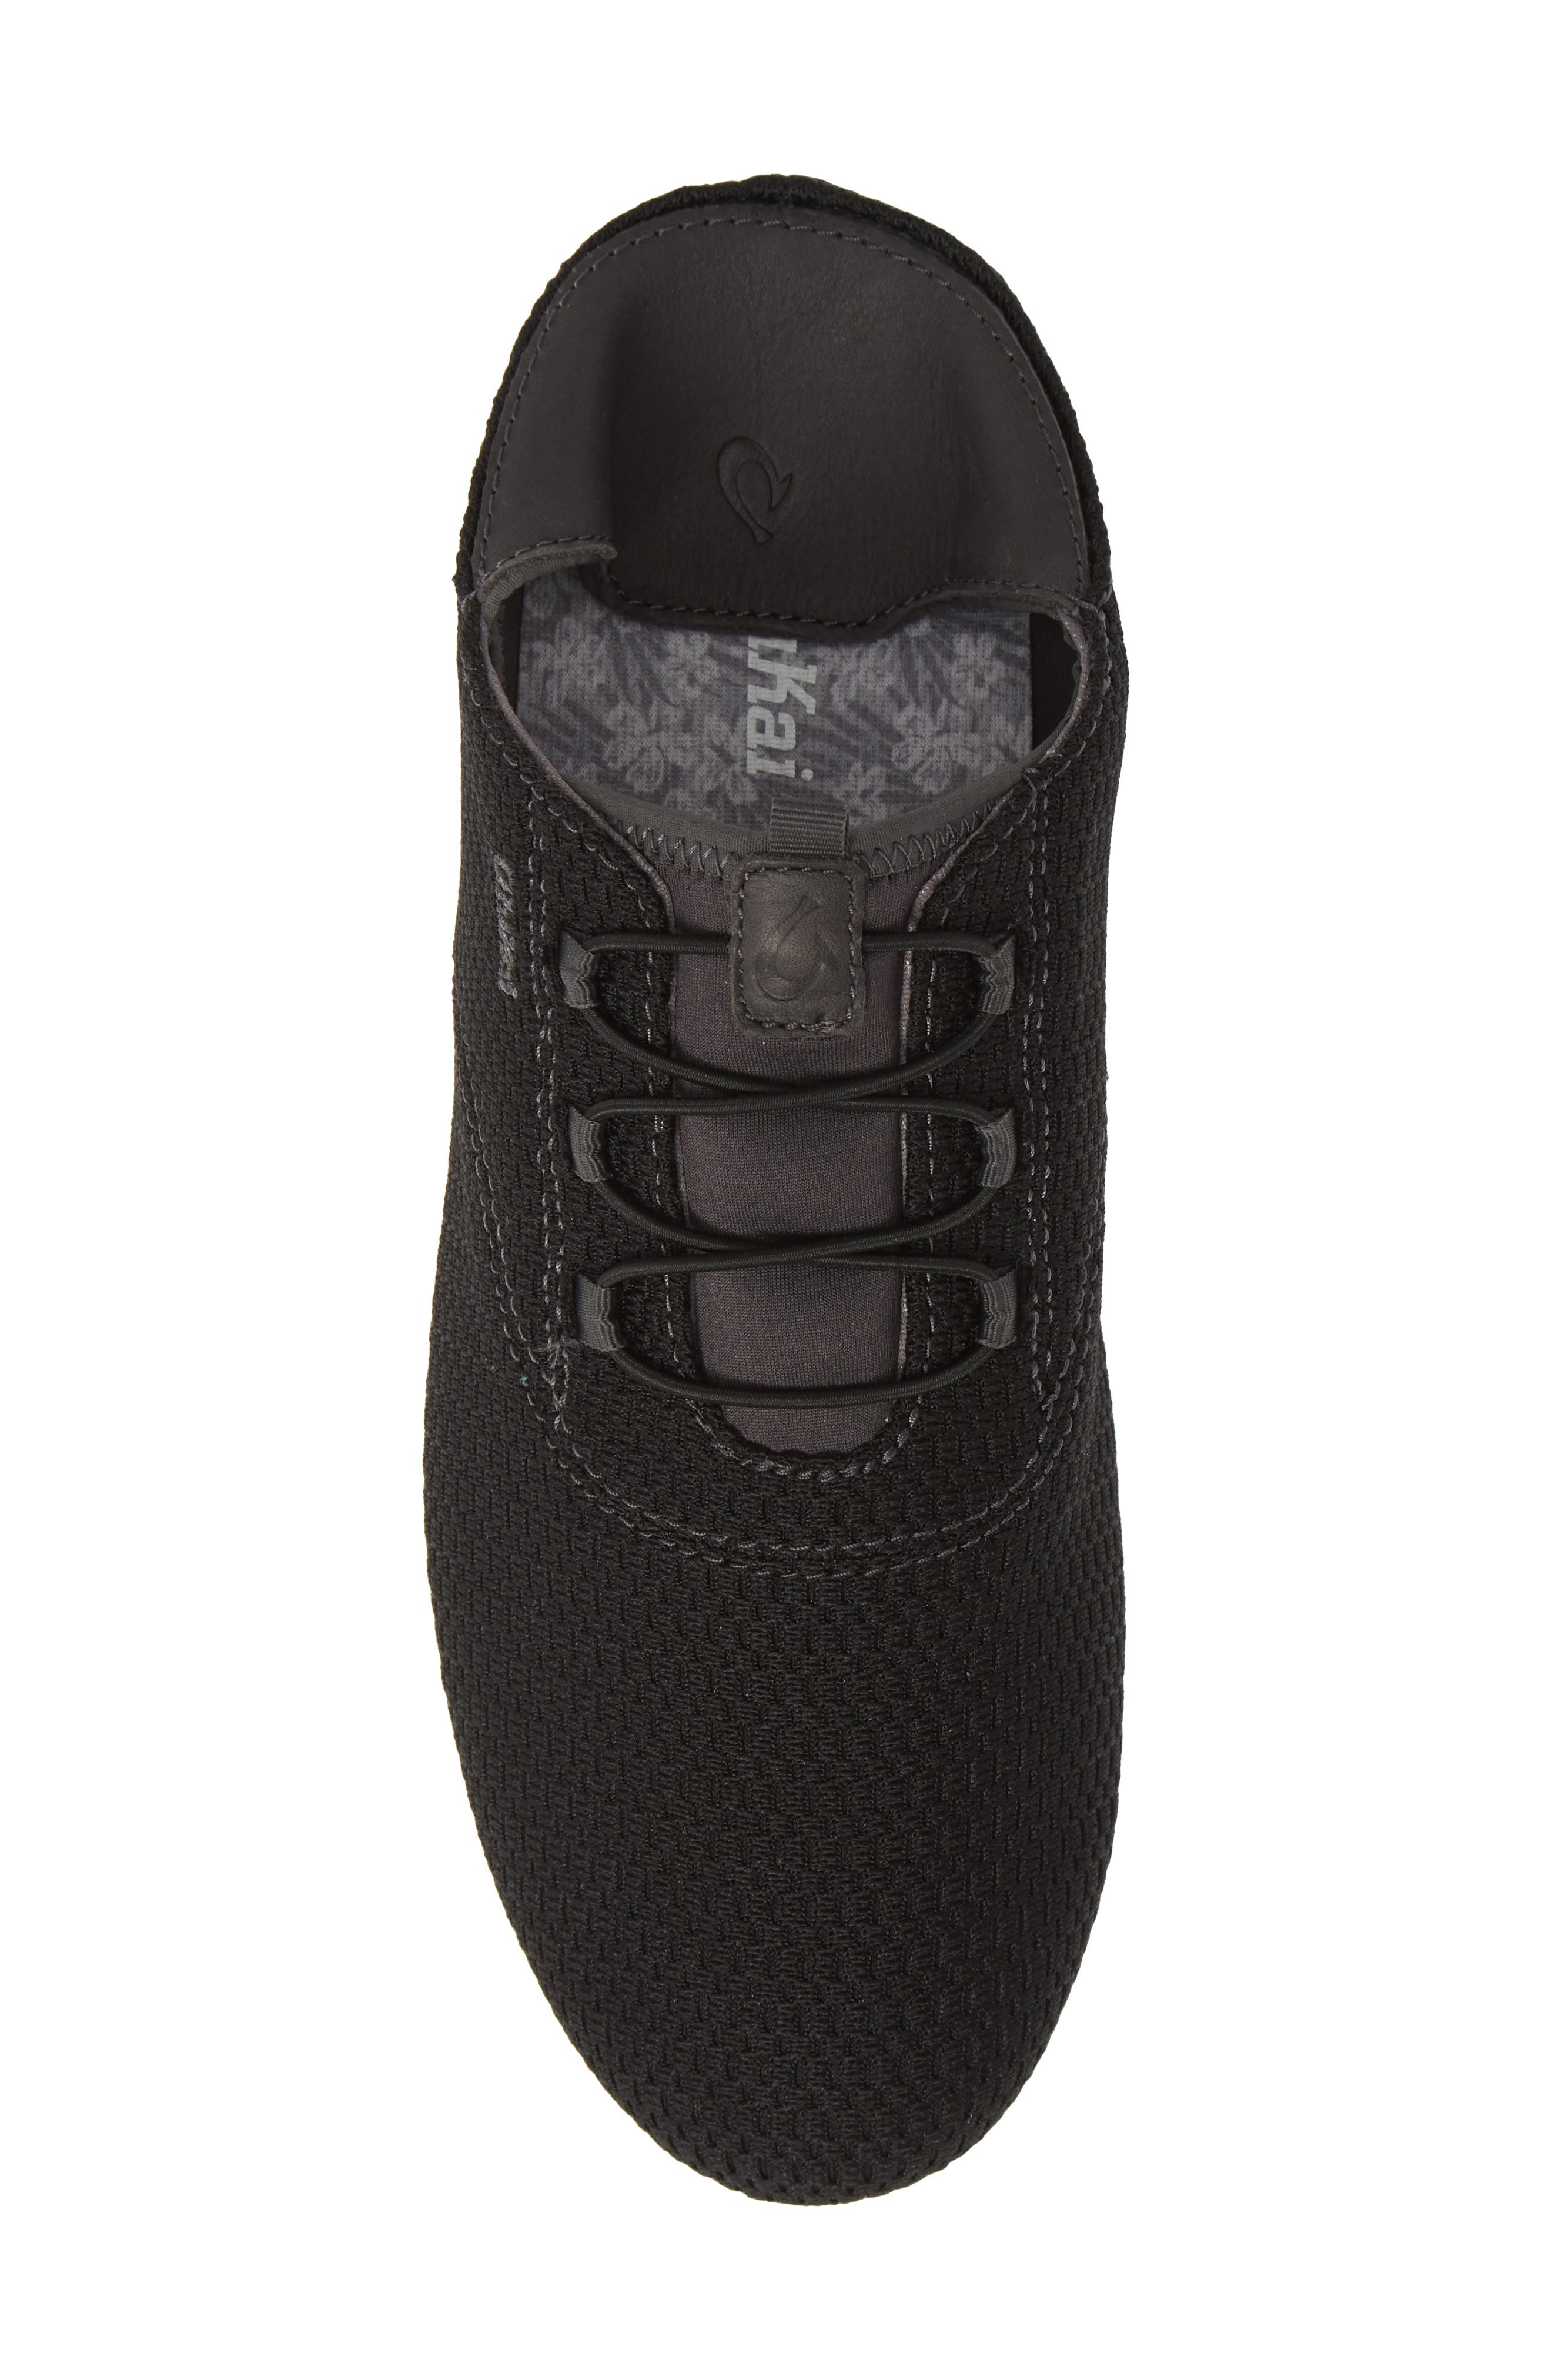 OLUKAI, Alapa Li Sneaker, Alternate thumbnail 6, color, BLACK/ DARK SHADOW MESH